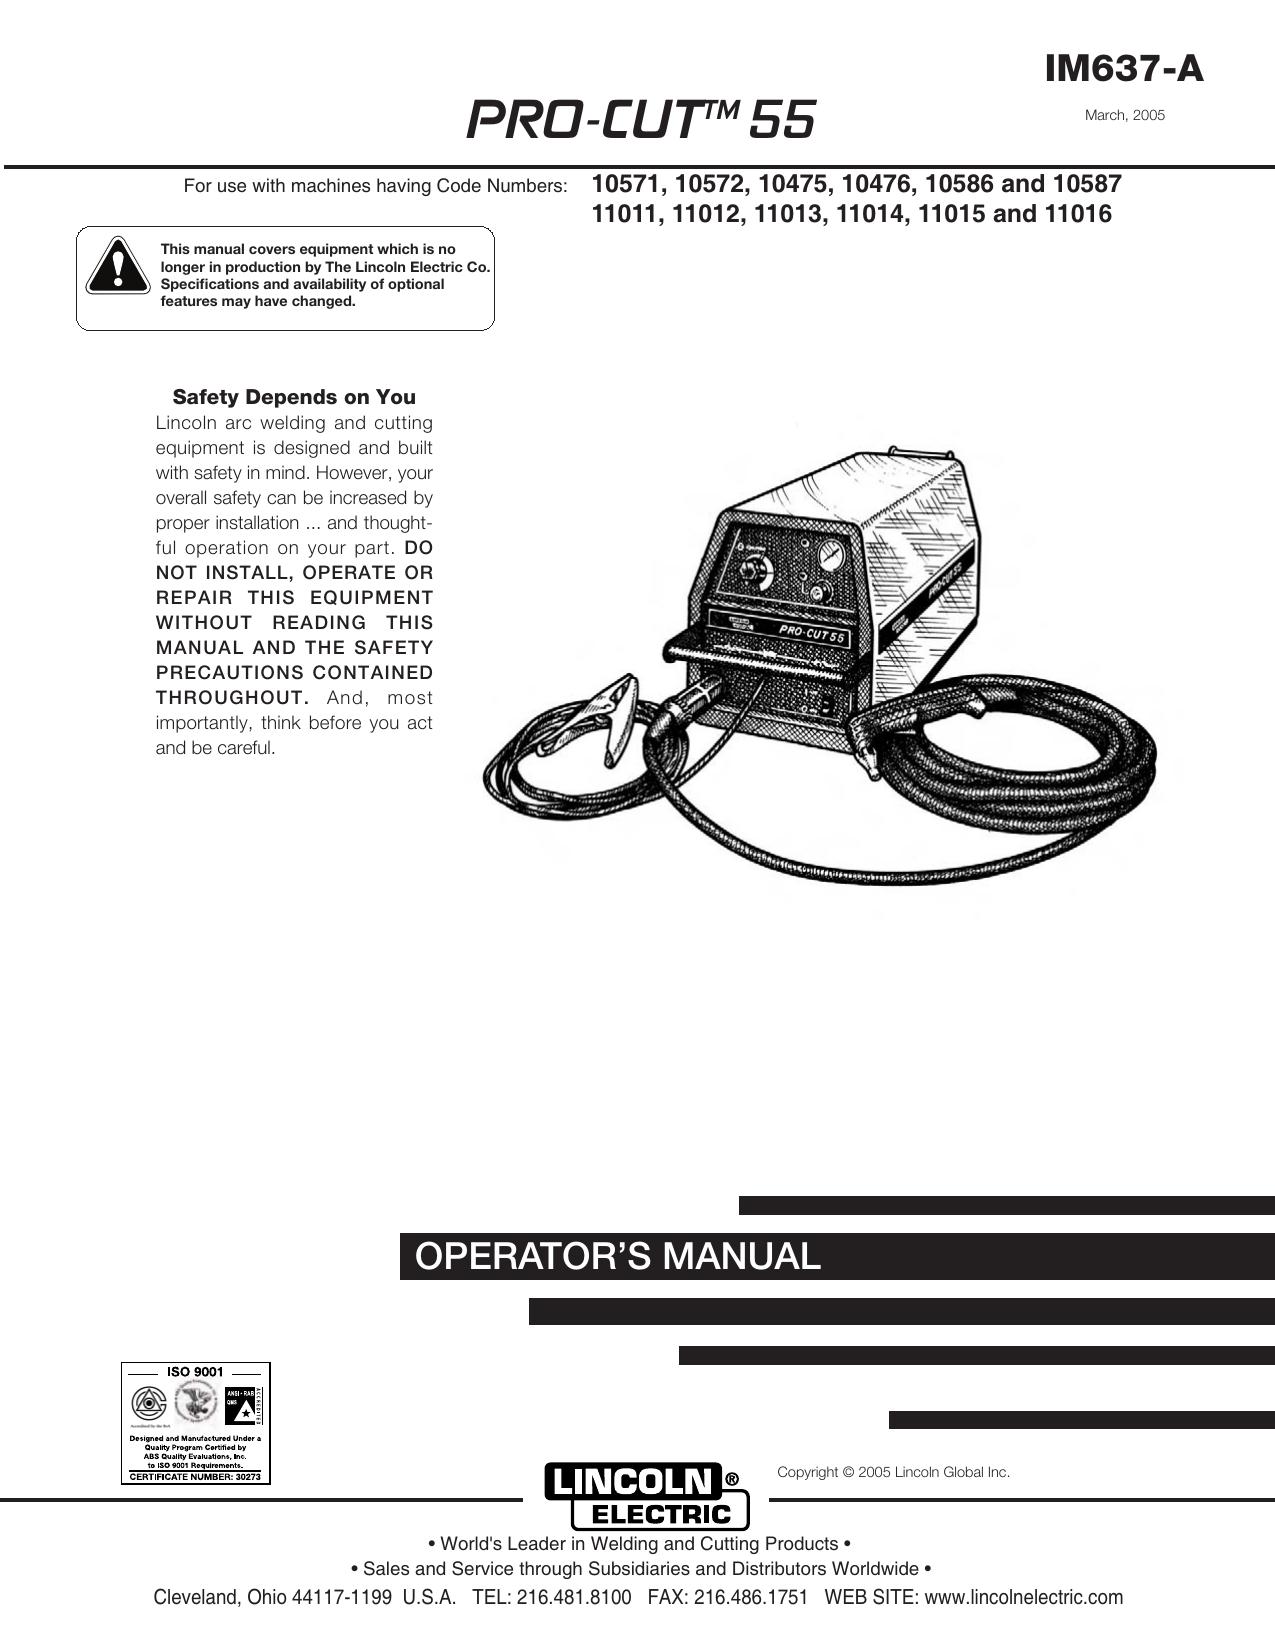 lincoln 305g wiring diagram pro cuttm 55 lincoln electric manualzz  pro cuttm 55 lincoln electric manualzz